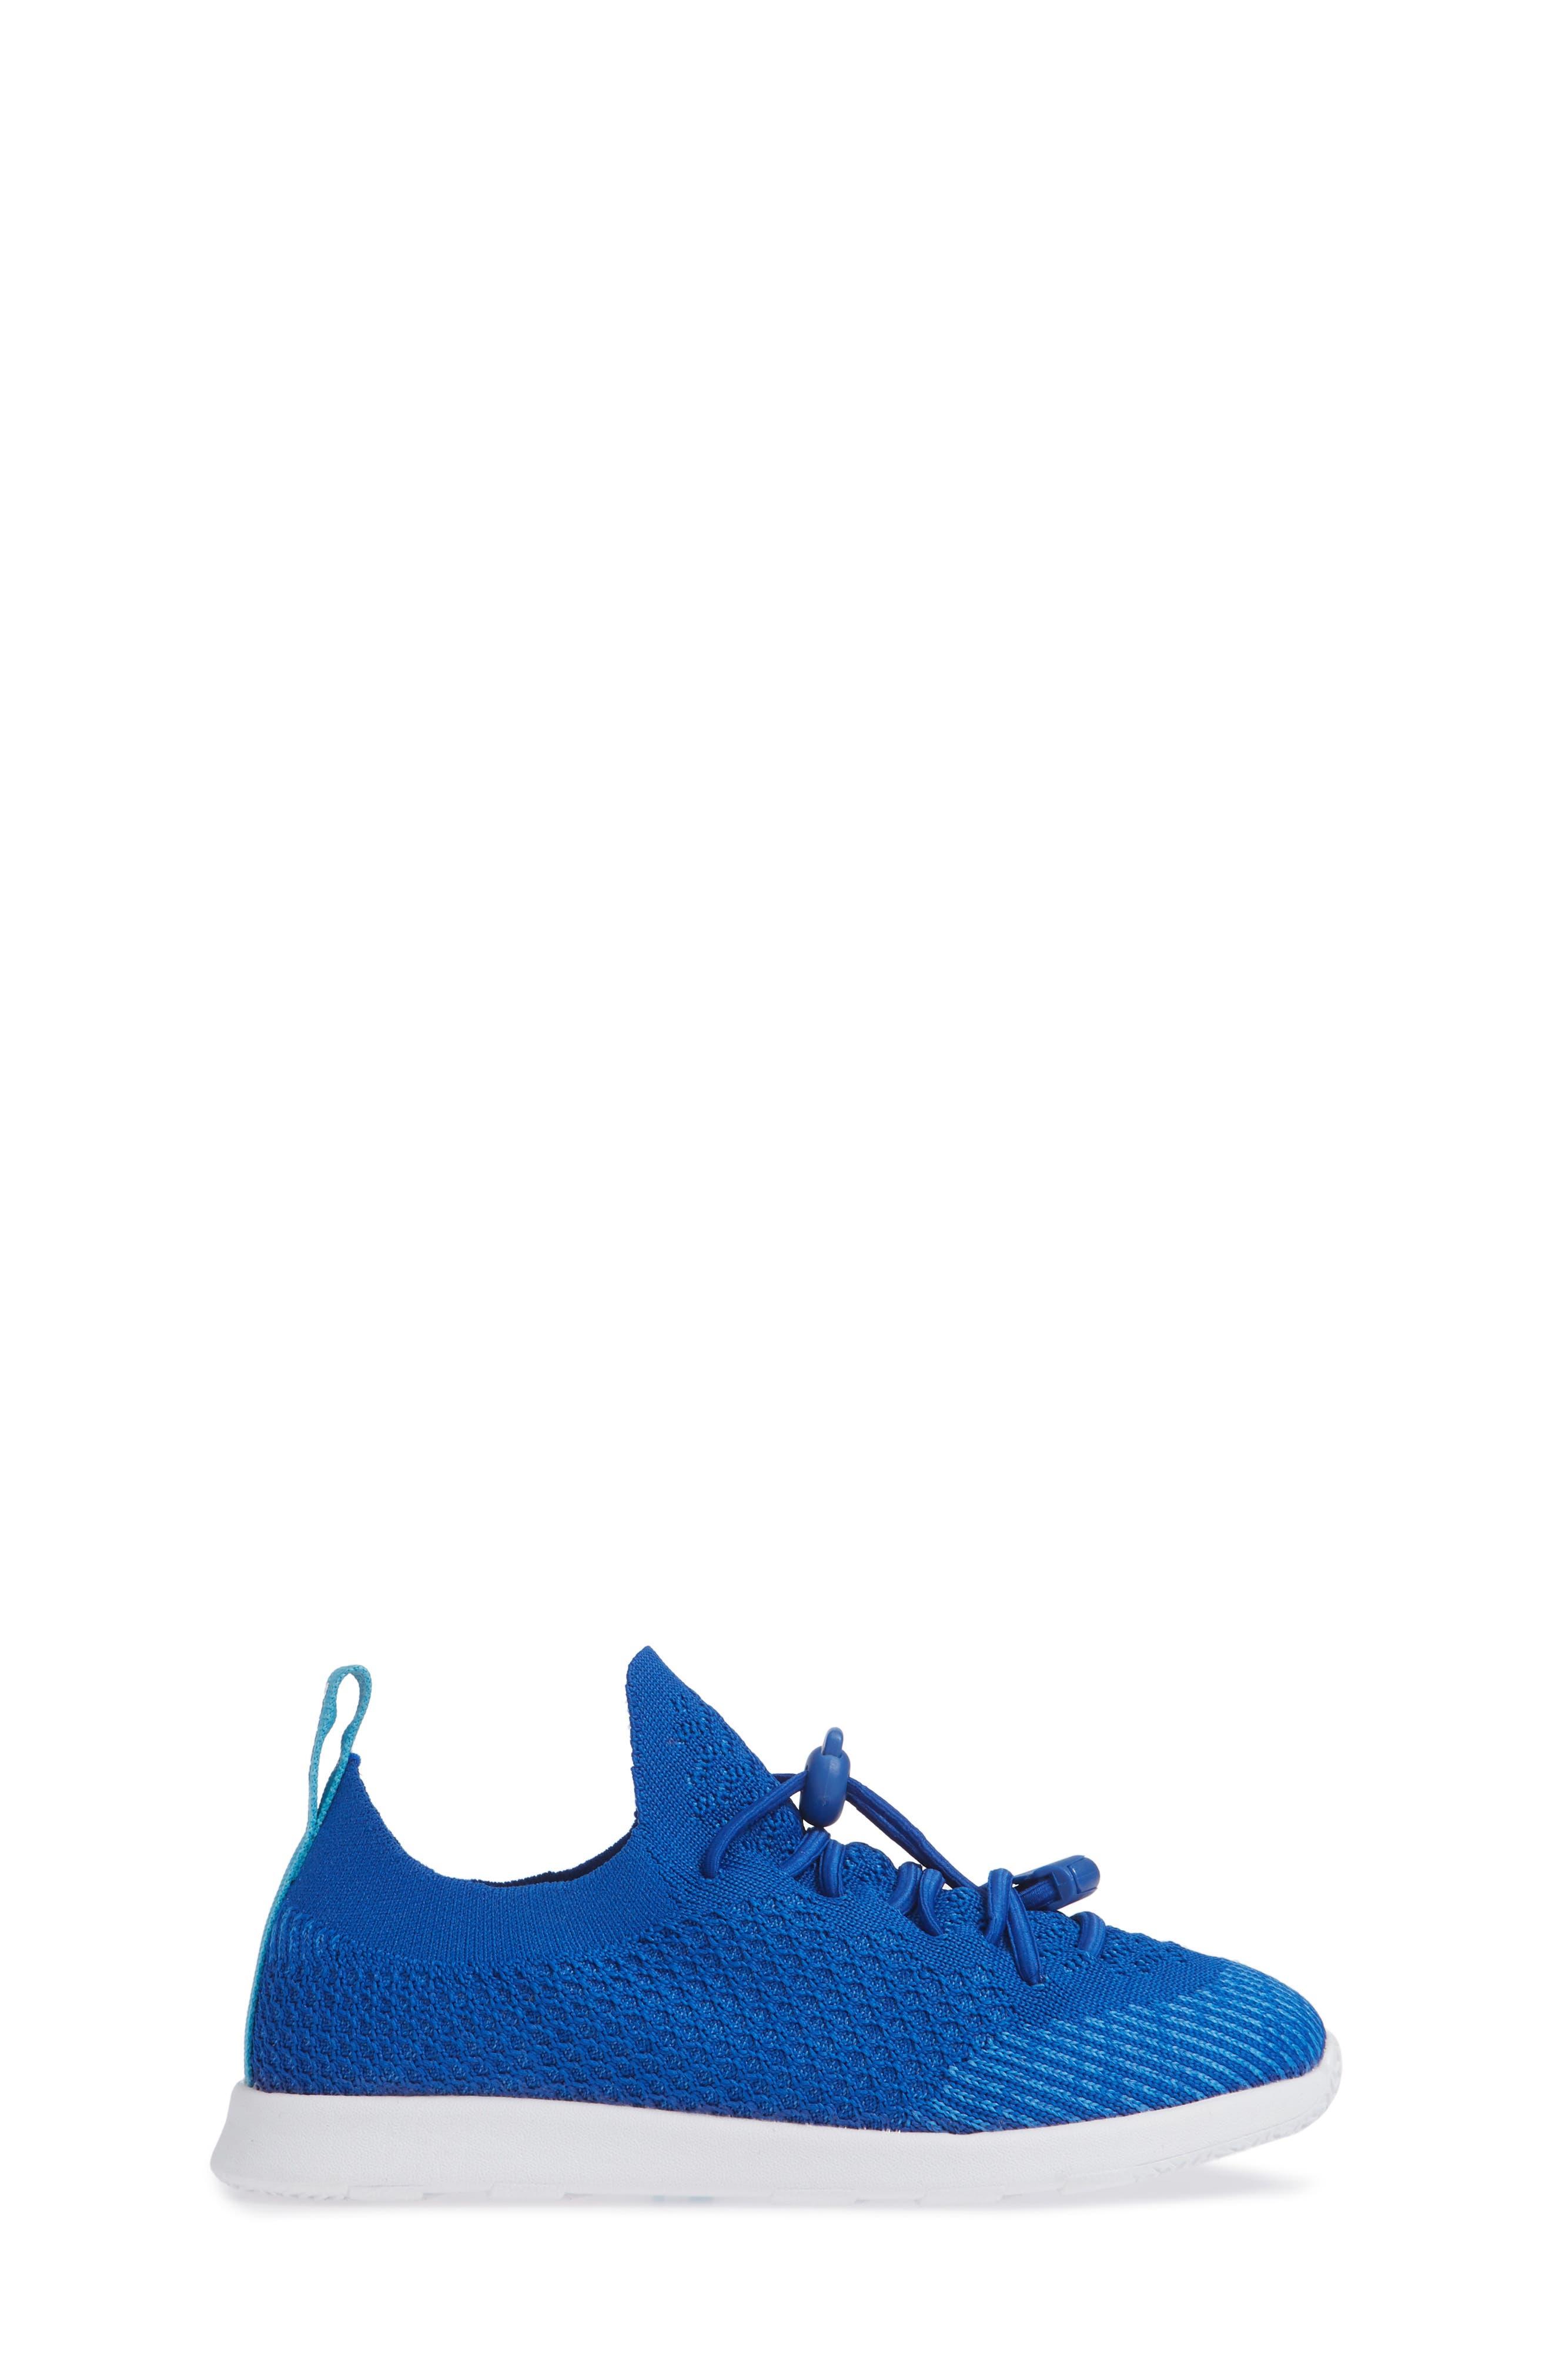 AP Mercury LiteKnit Sneaker,                             Alternate thumbnail 3, color,                             VICTORIA BLUE/ SHELL WHITE